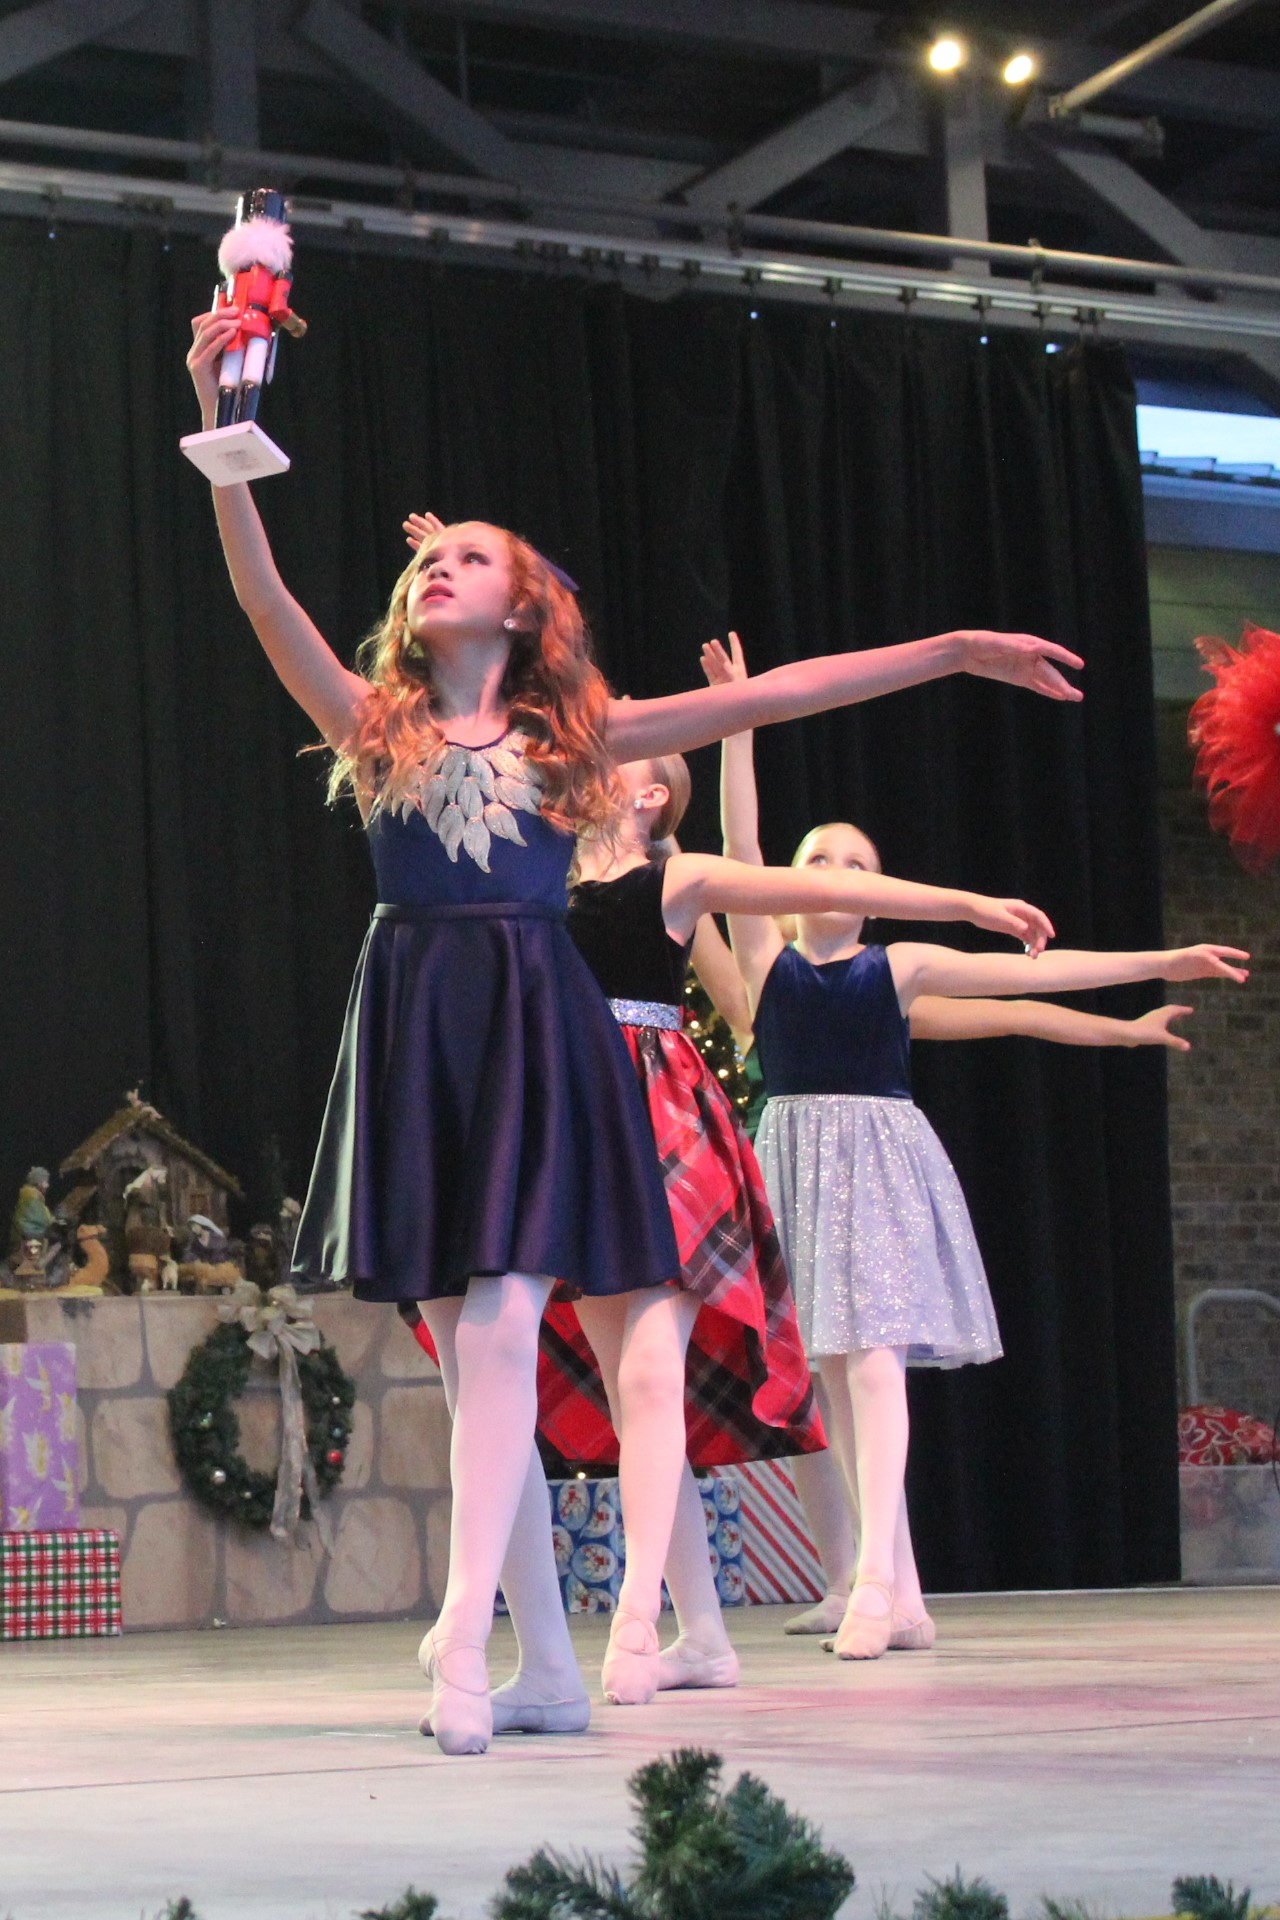 Clara and ballet dancers in the Nutcracker